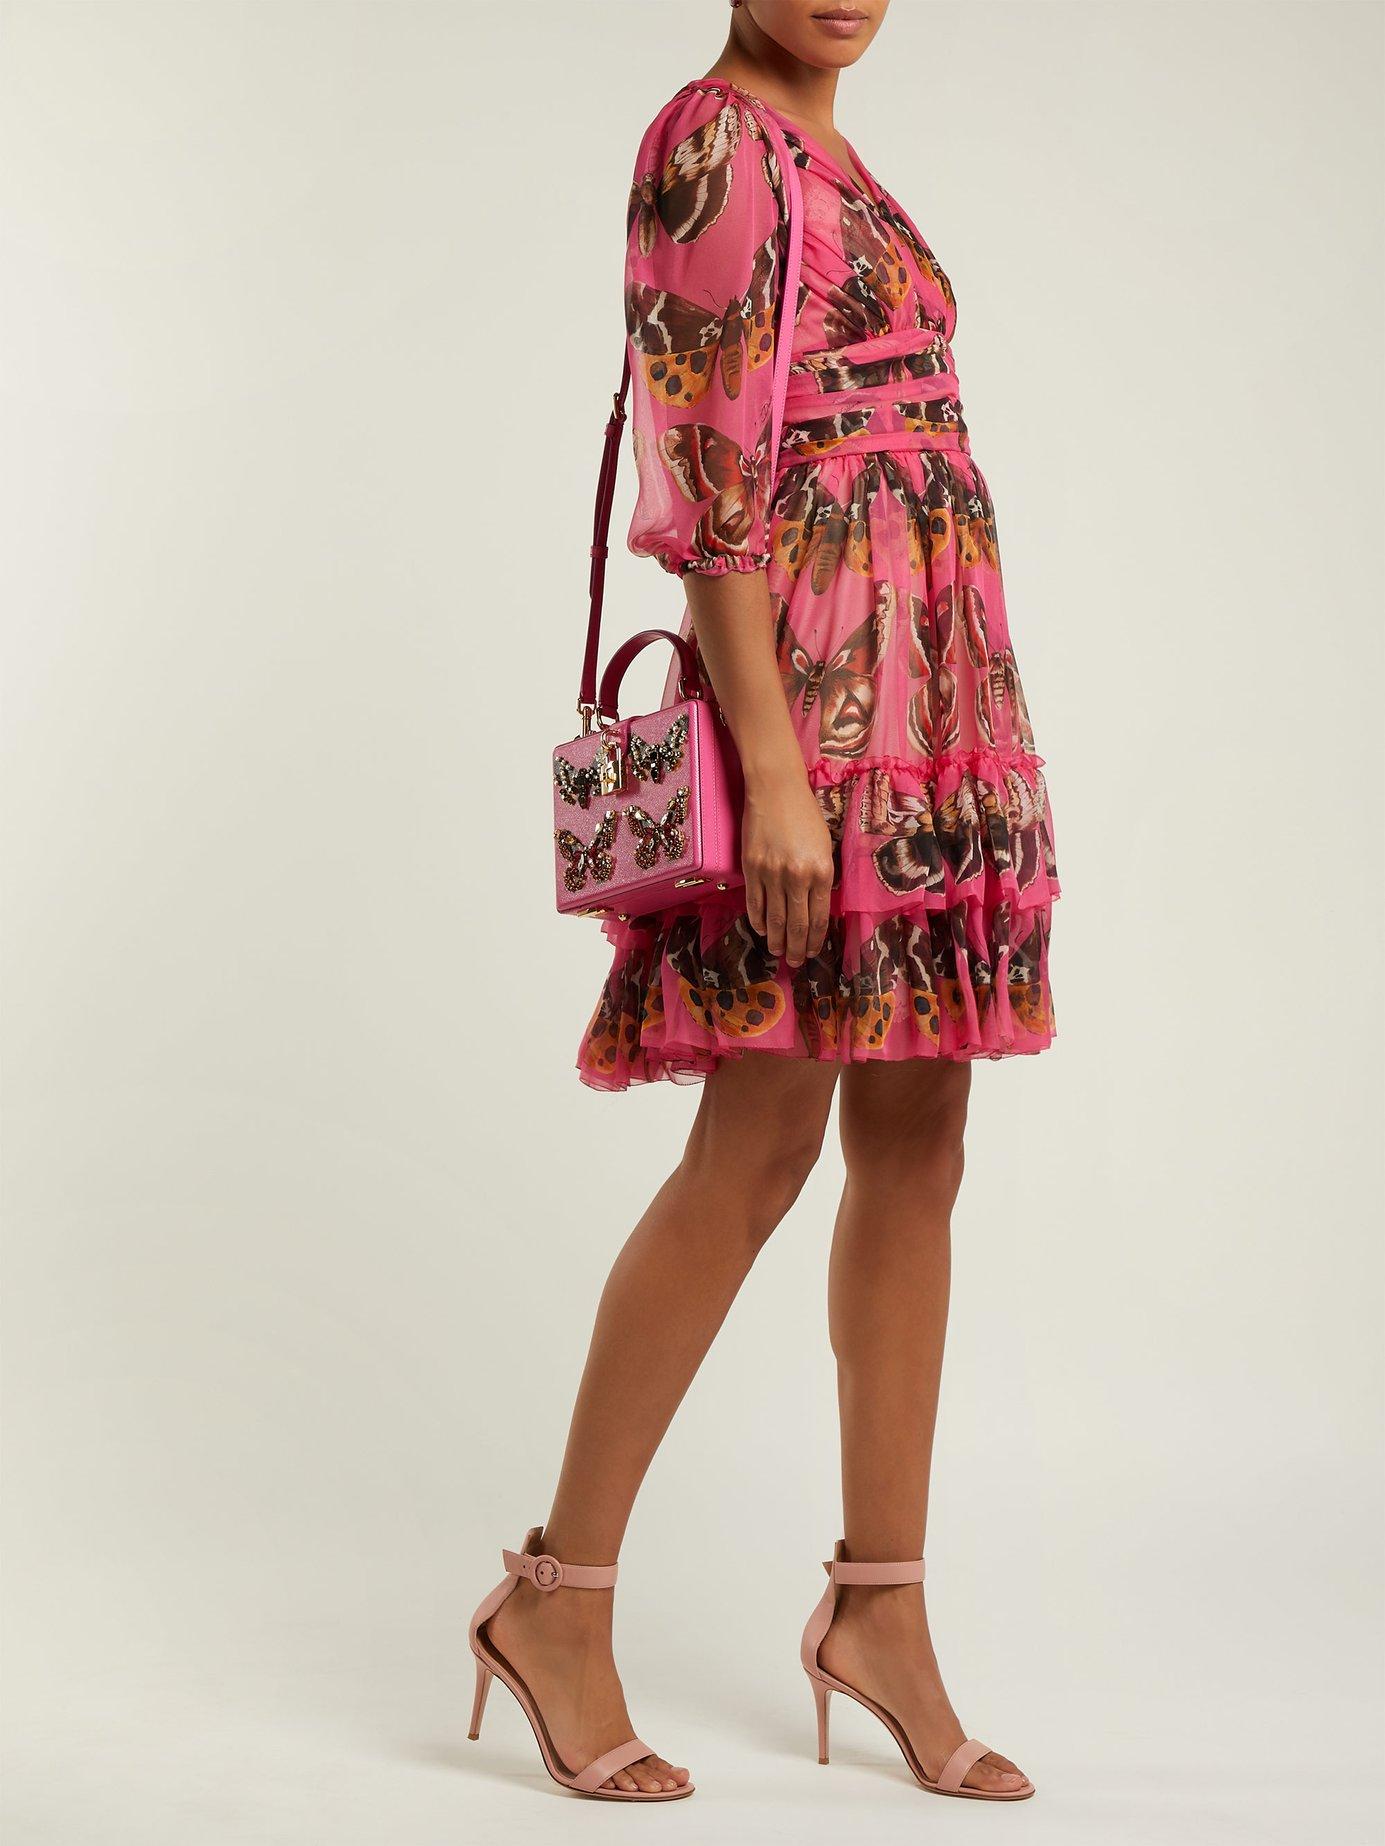 Butterfly-print silk-chiffon mini dress by Dolce & Gabbana